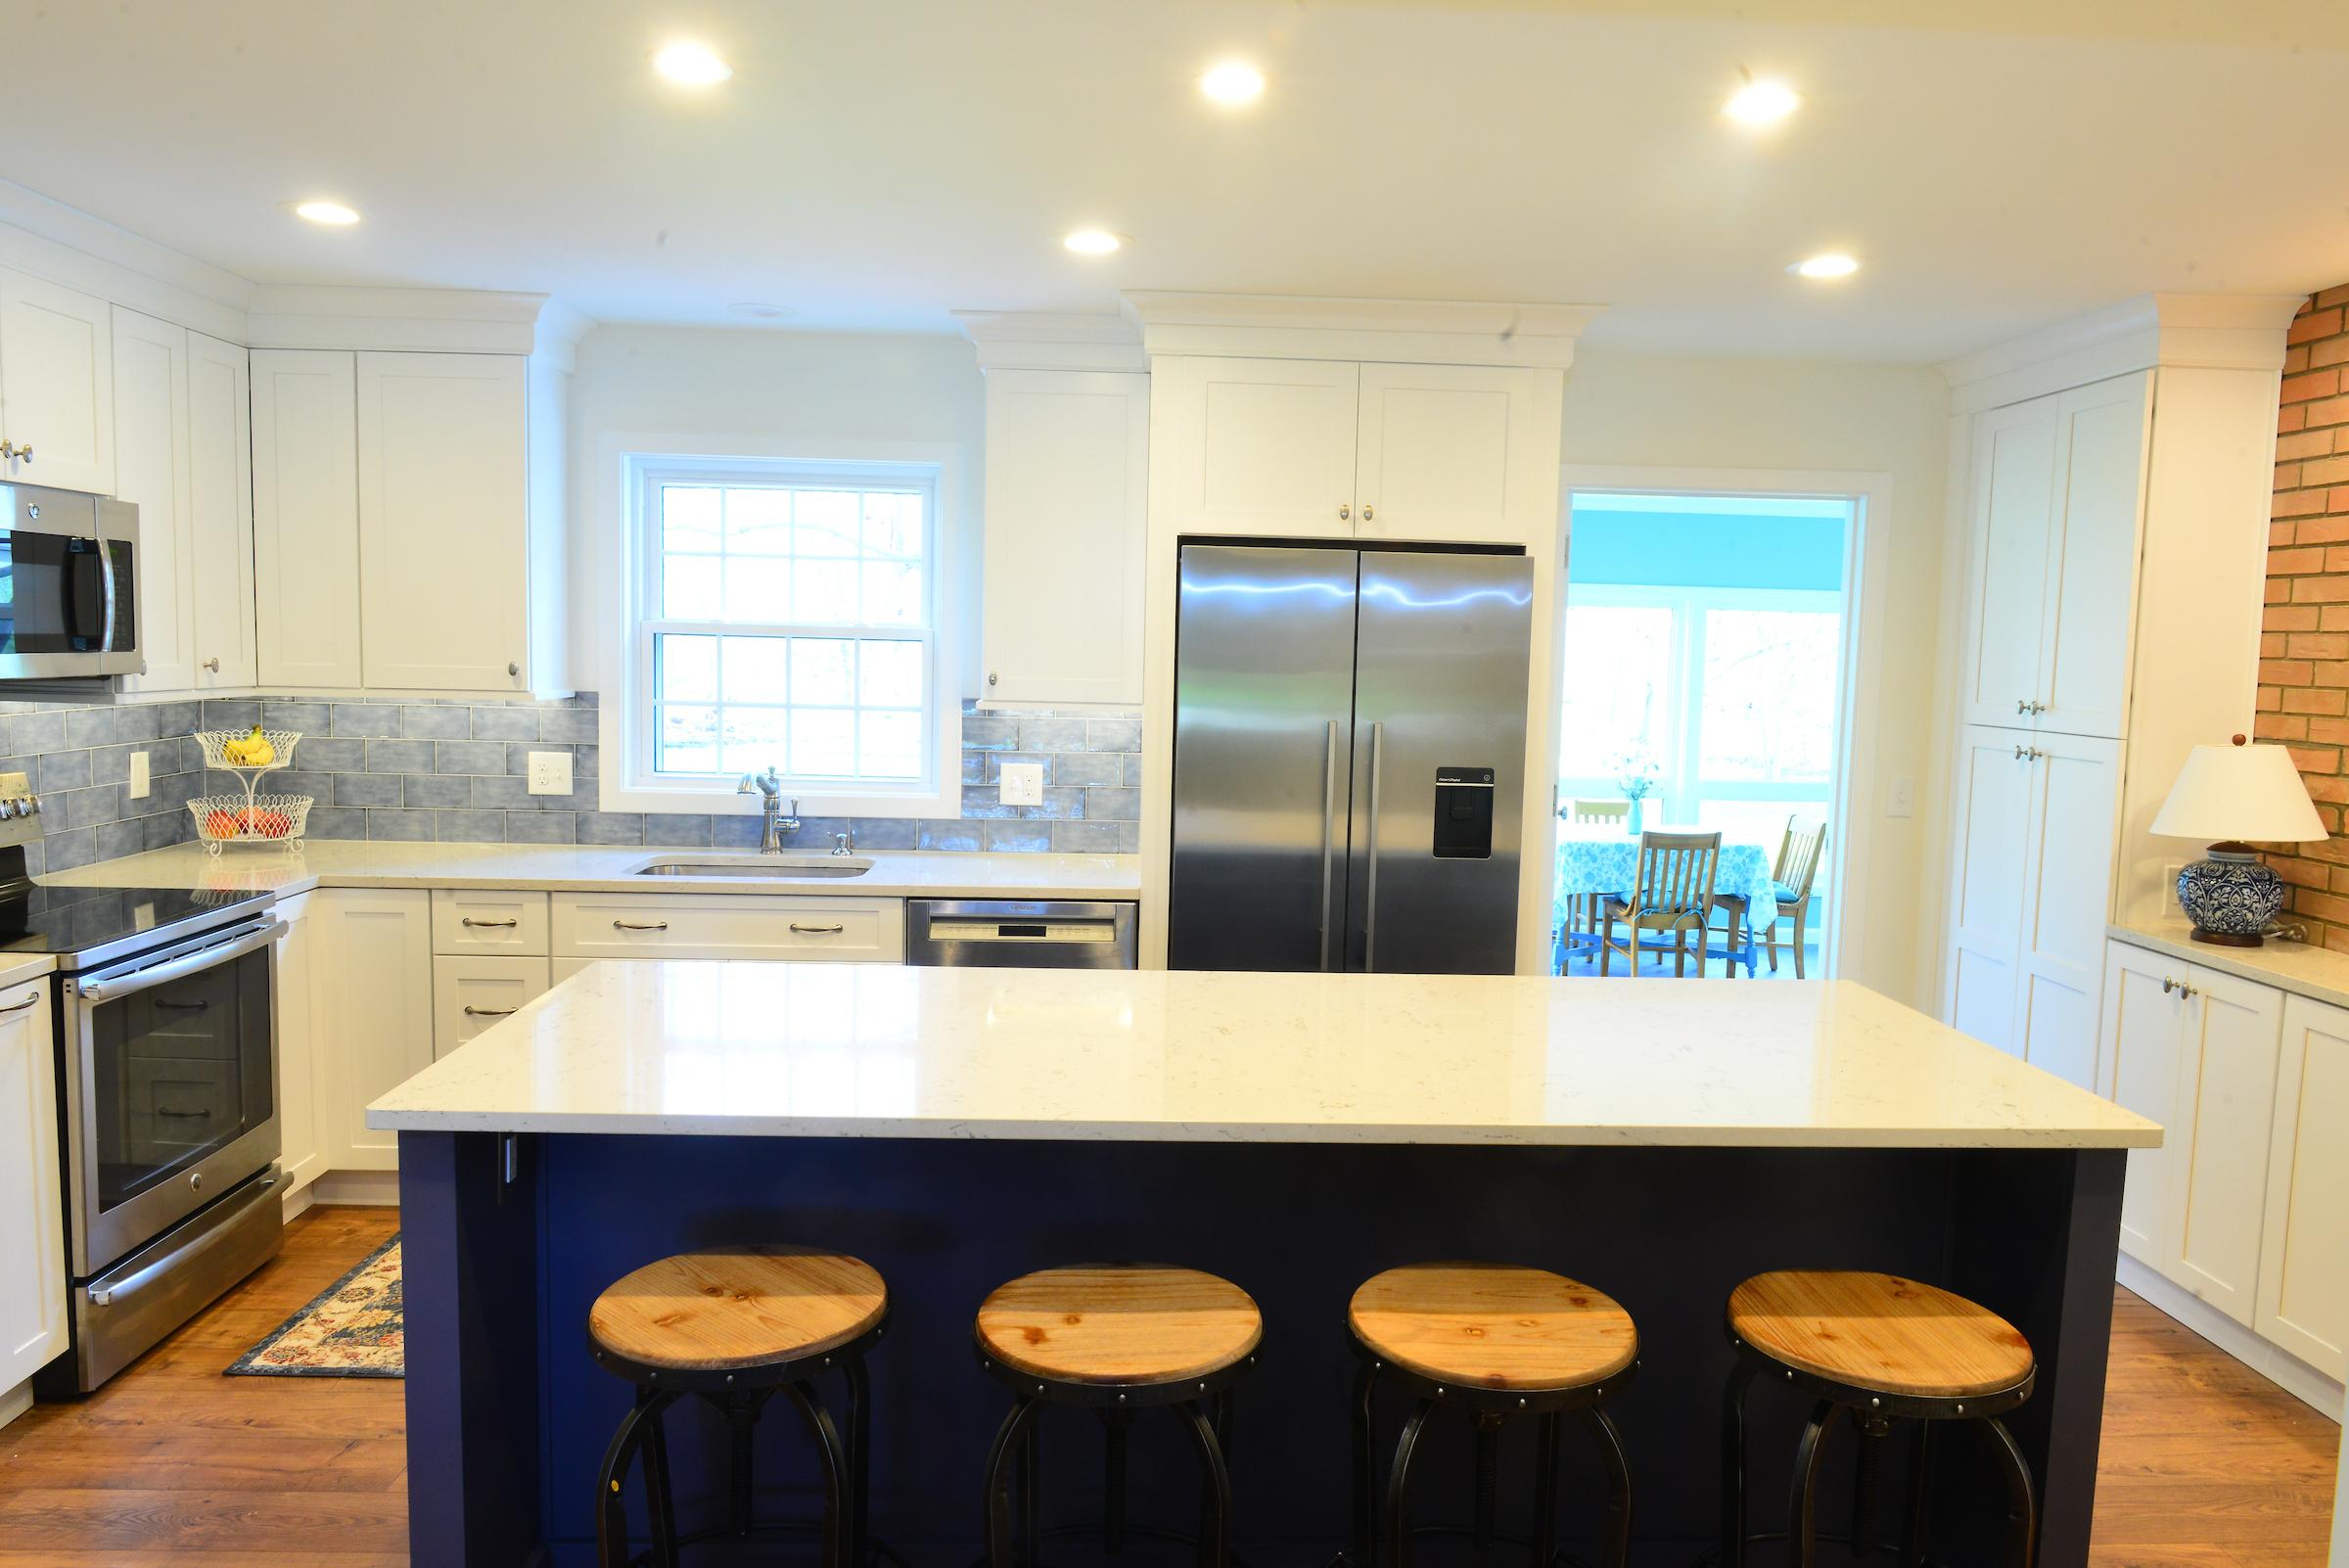 Kitchen Remodel Kitchen Design And Remodel Kitchen